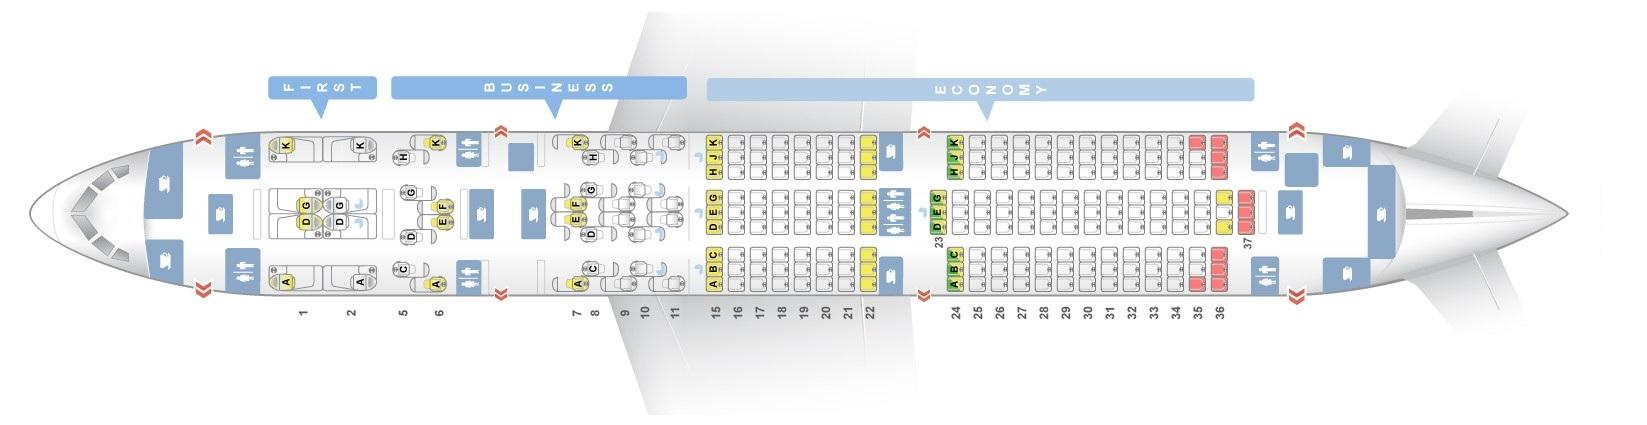 Seat Map Boeing 787 9 Dreamliner Etihad Airways Best Seats In The Plane